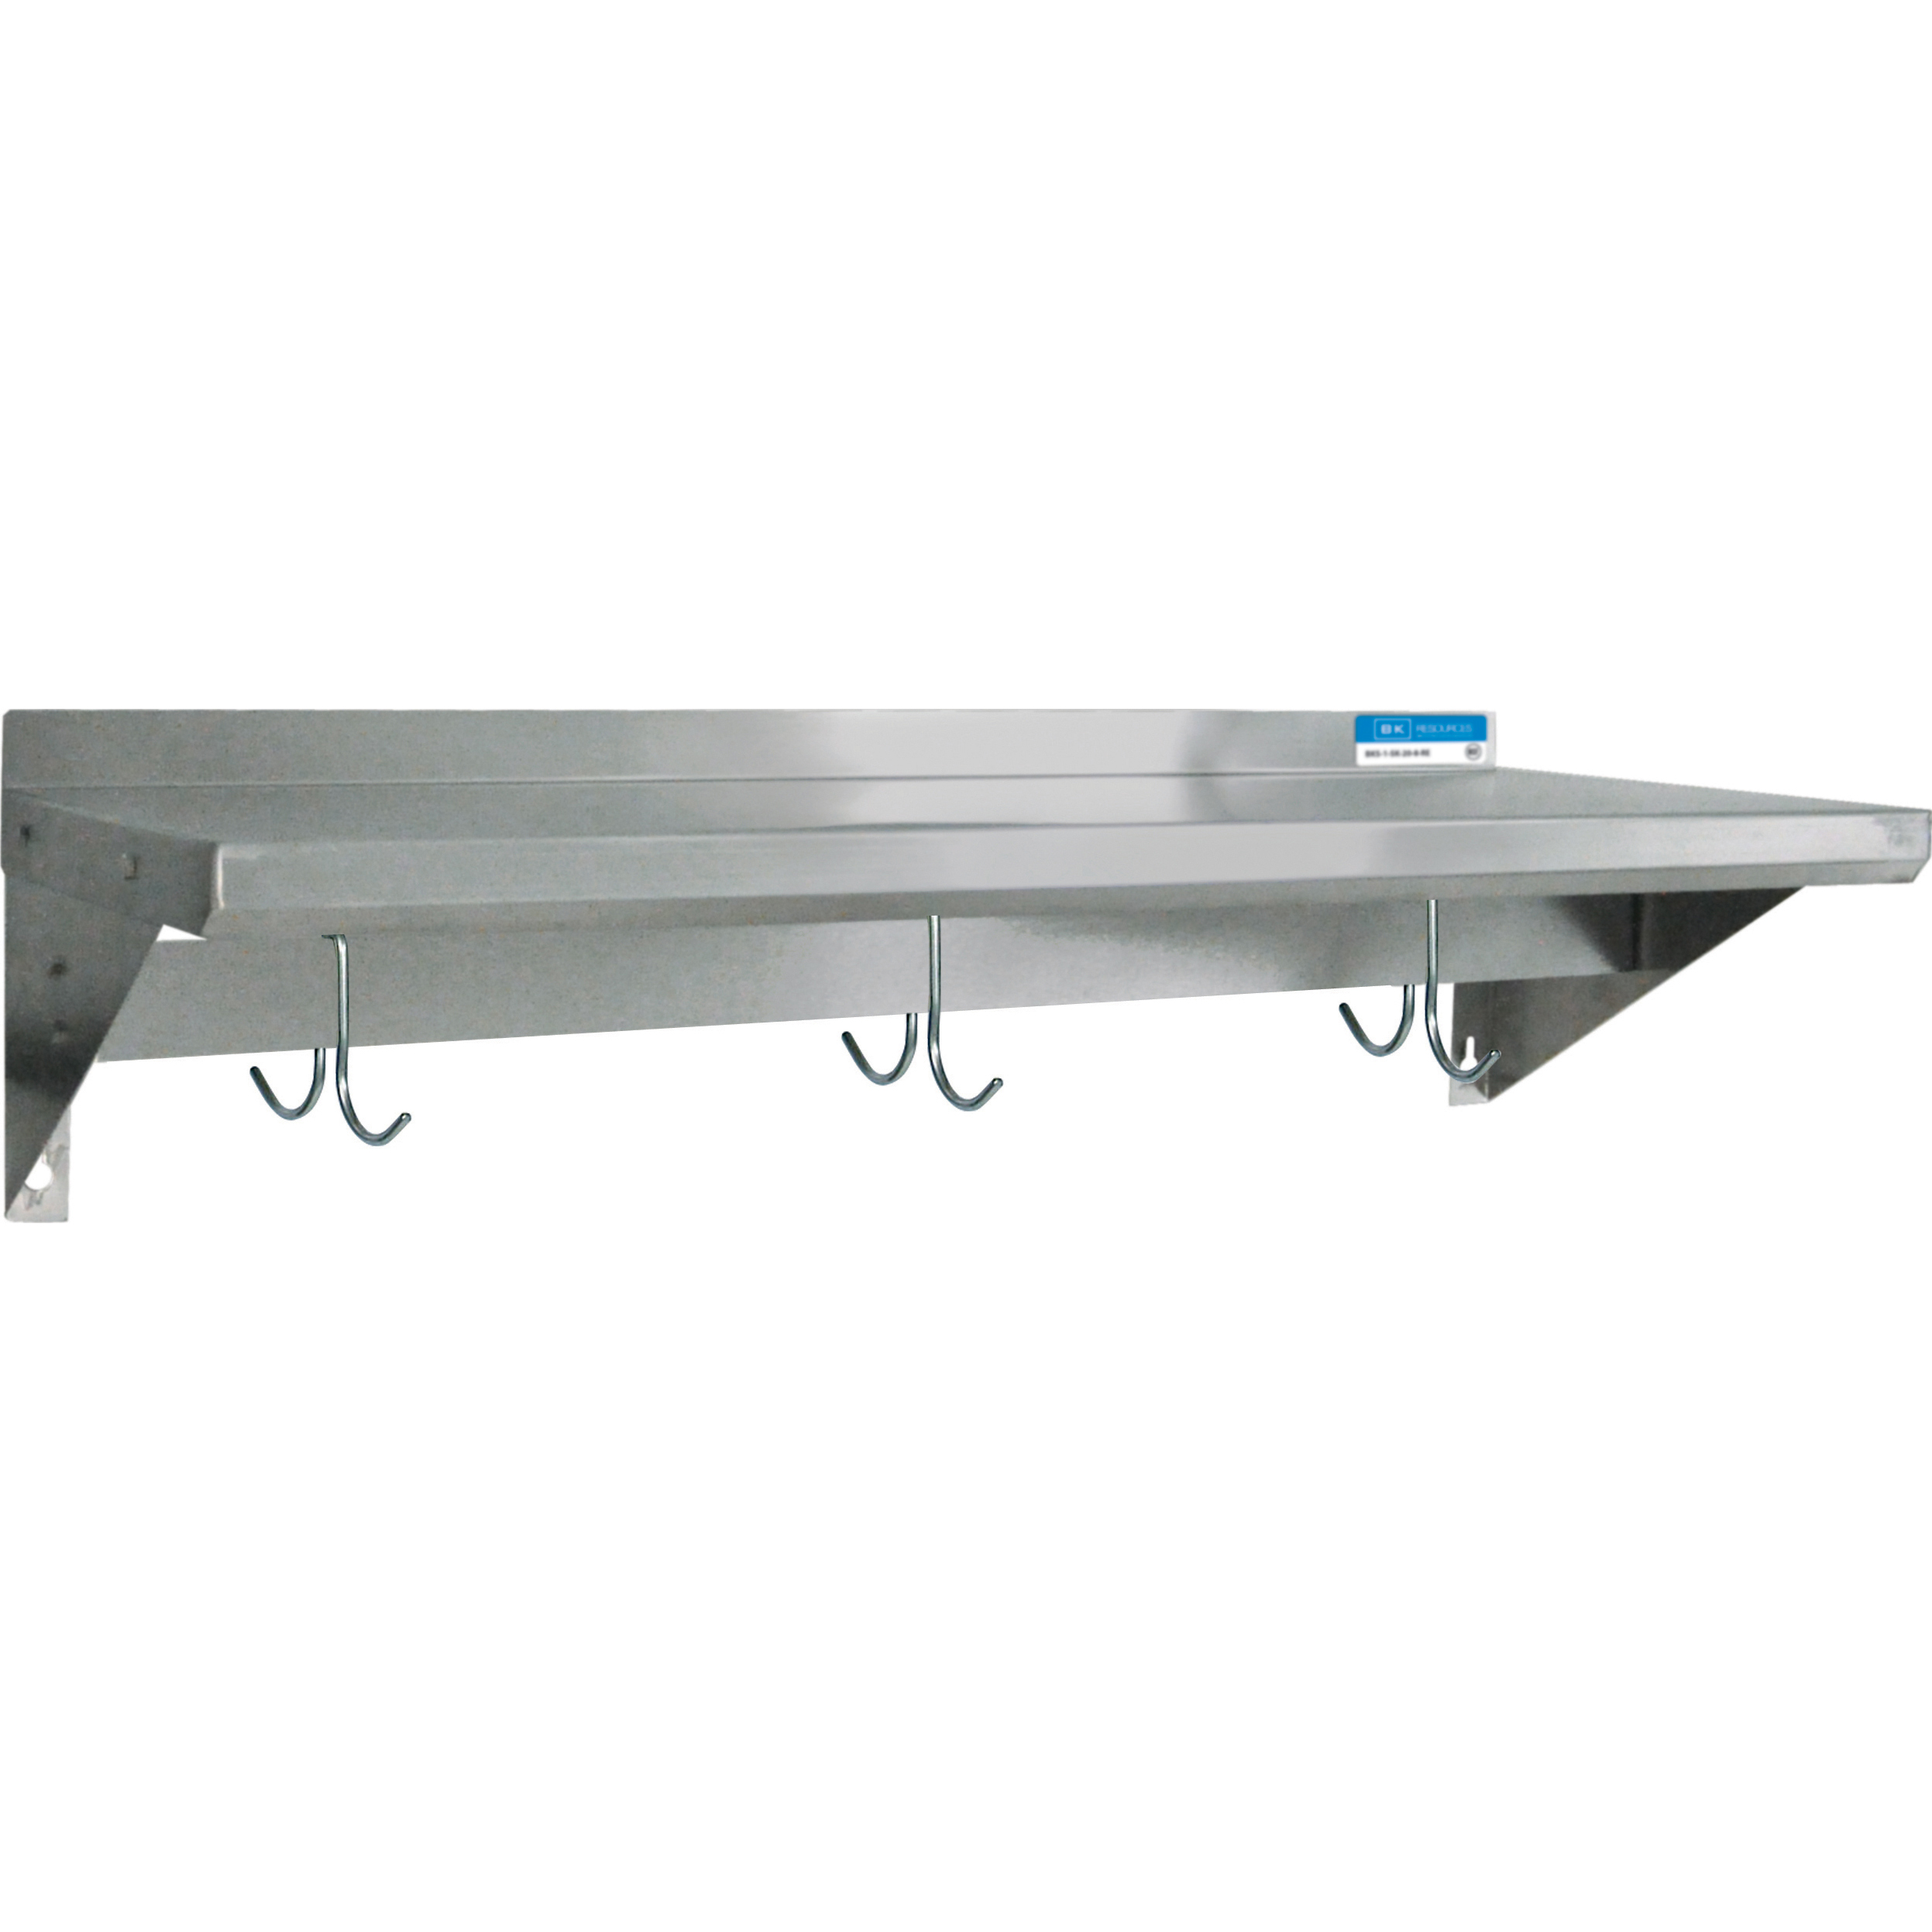 BK Resources BKWS6-1460-PR overshelf, wall-mounted with pot rack